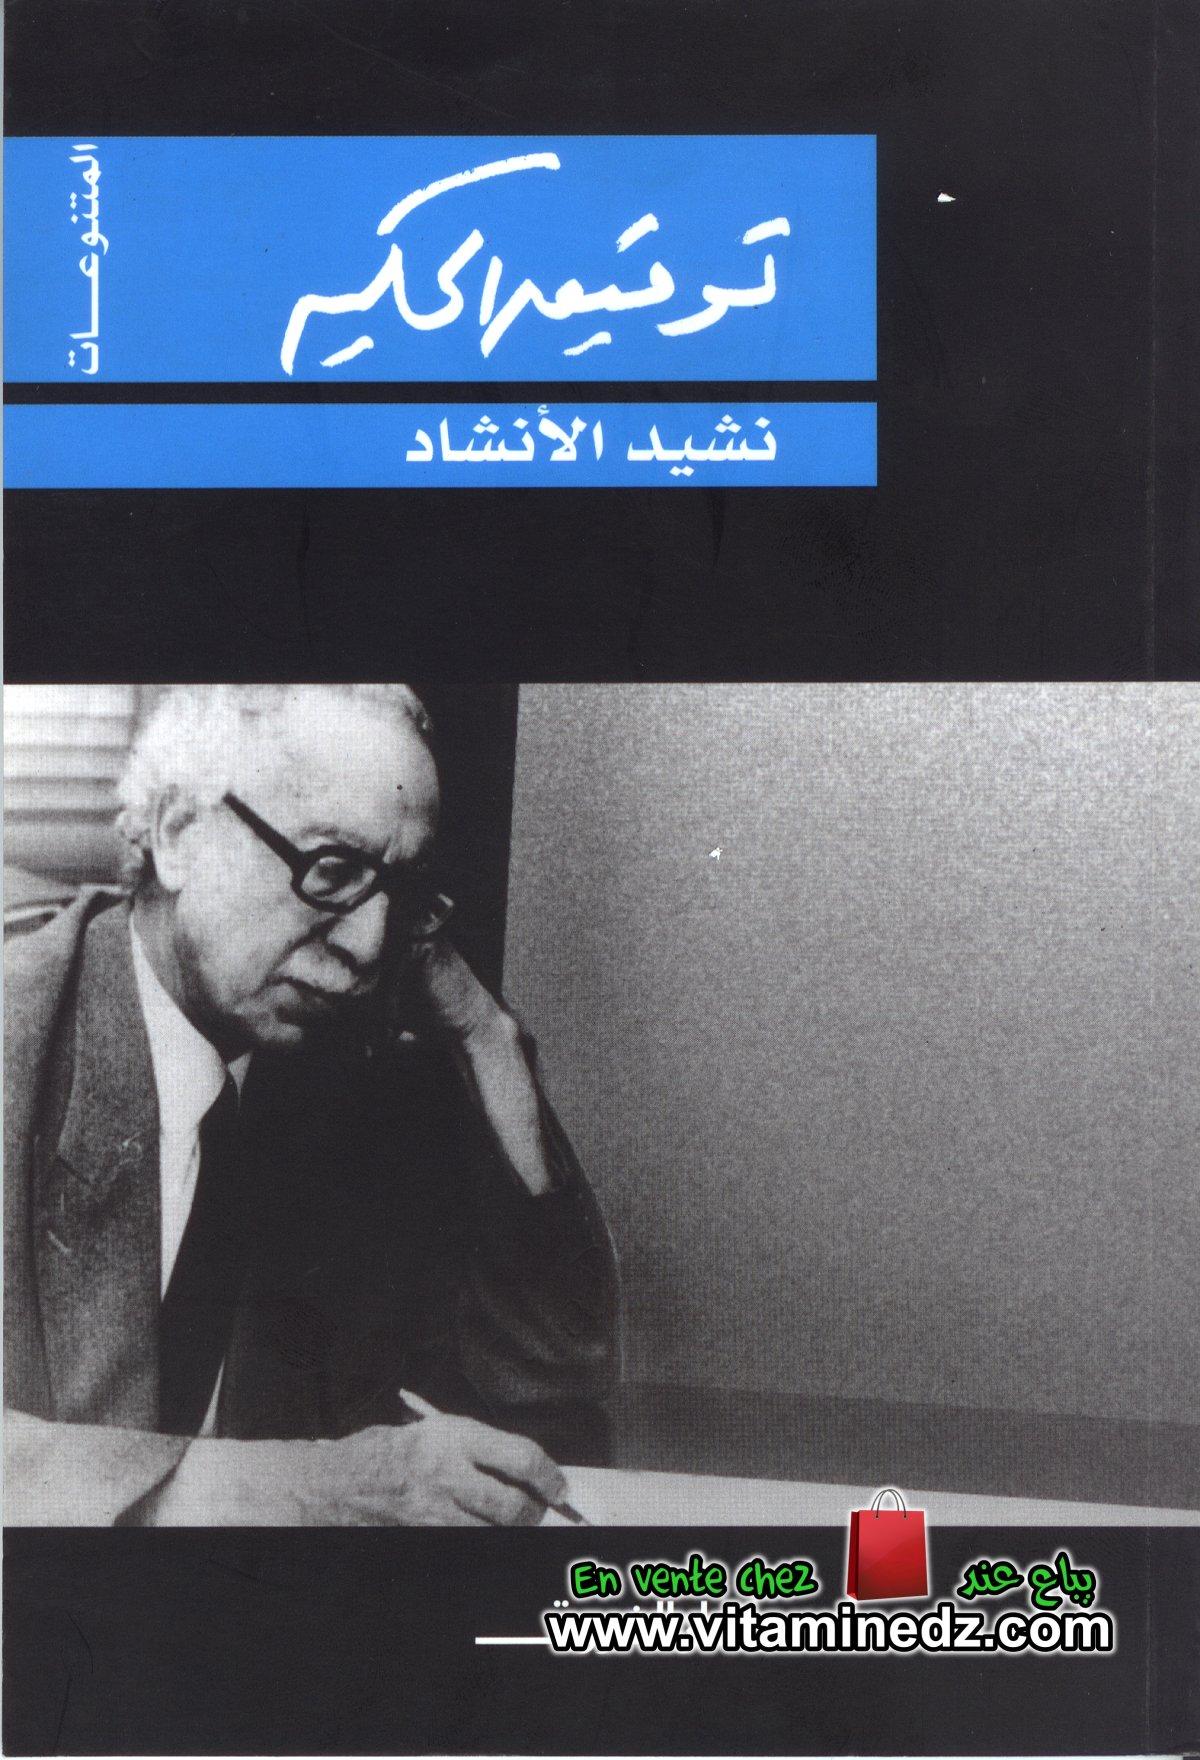 Tewfik El Hakim - Nachid El Inchad